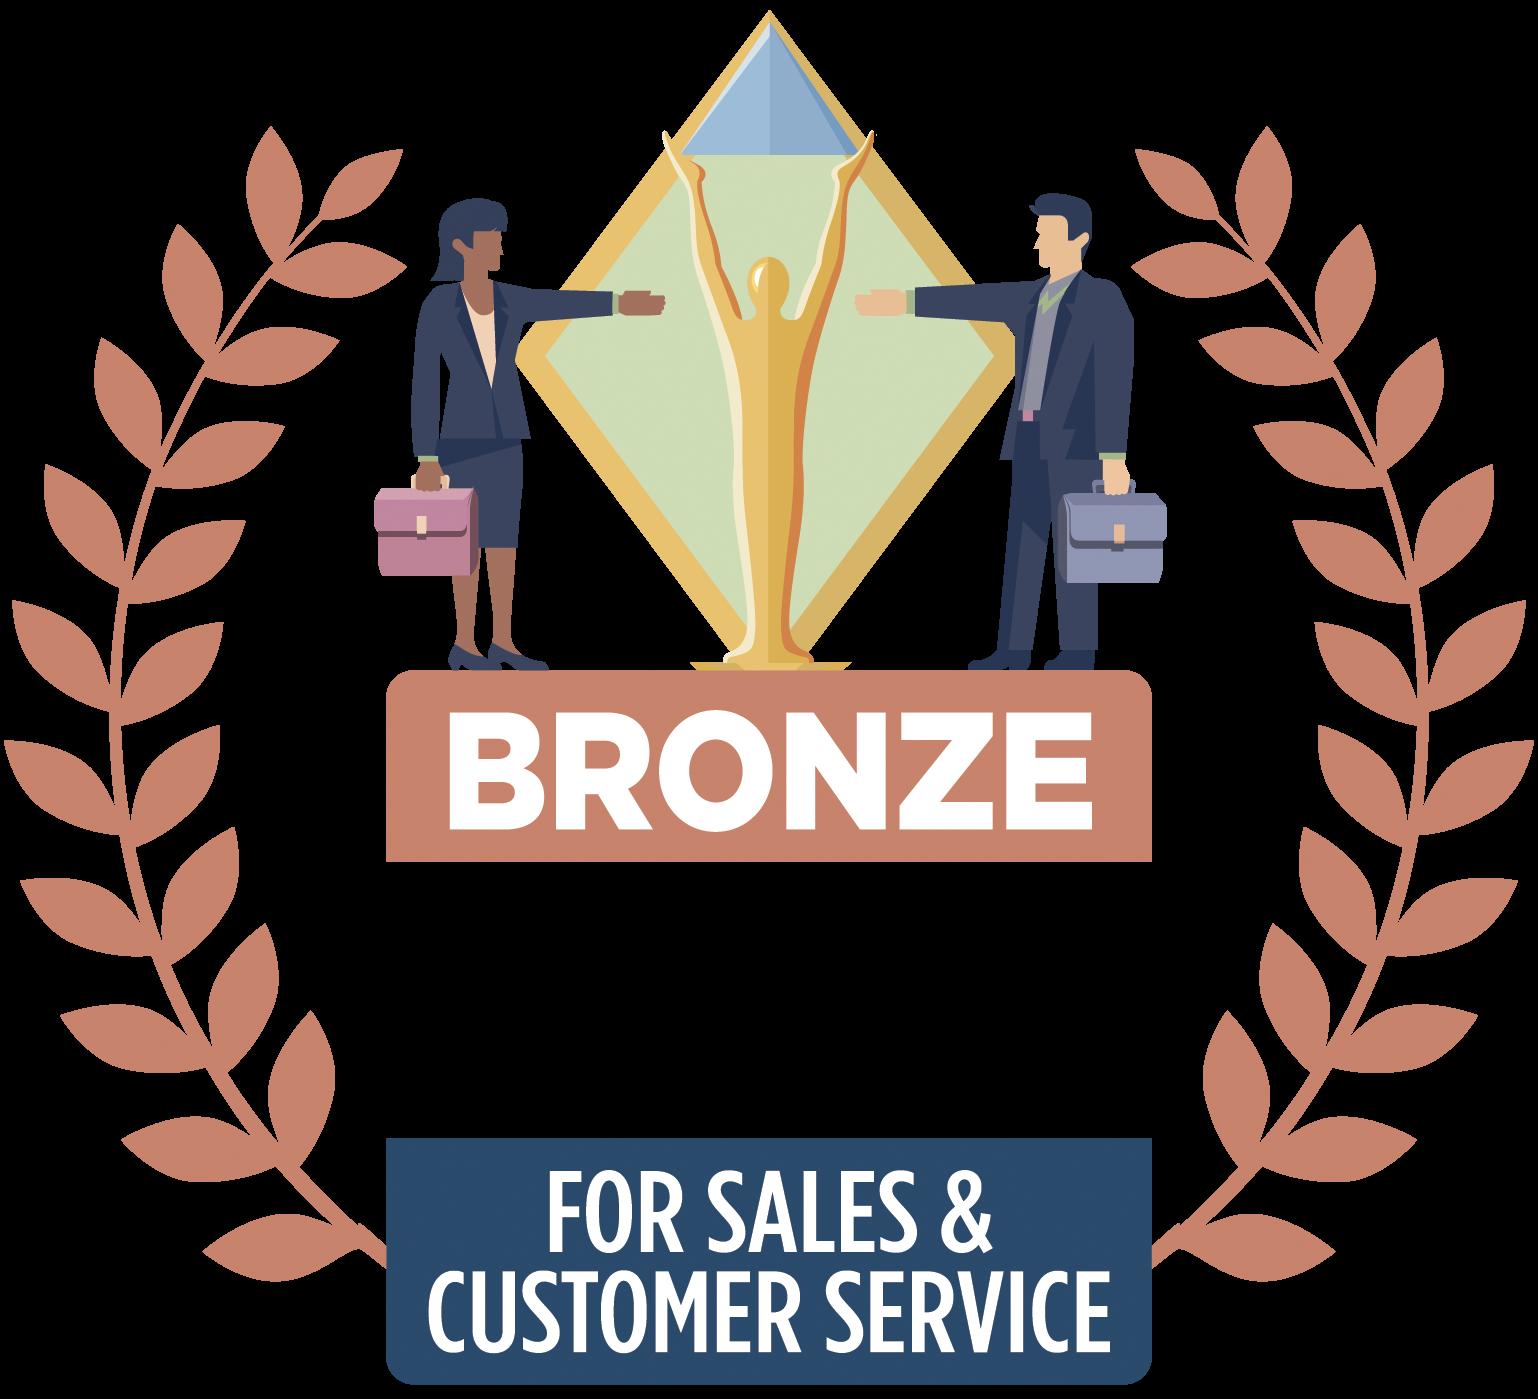 Sales Award 2020: Stevie Bronze for Sales Growth Achievement